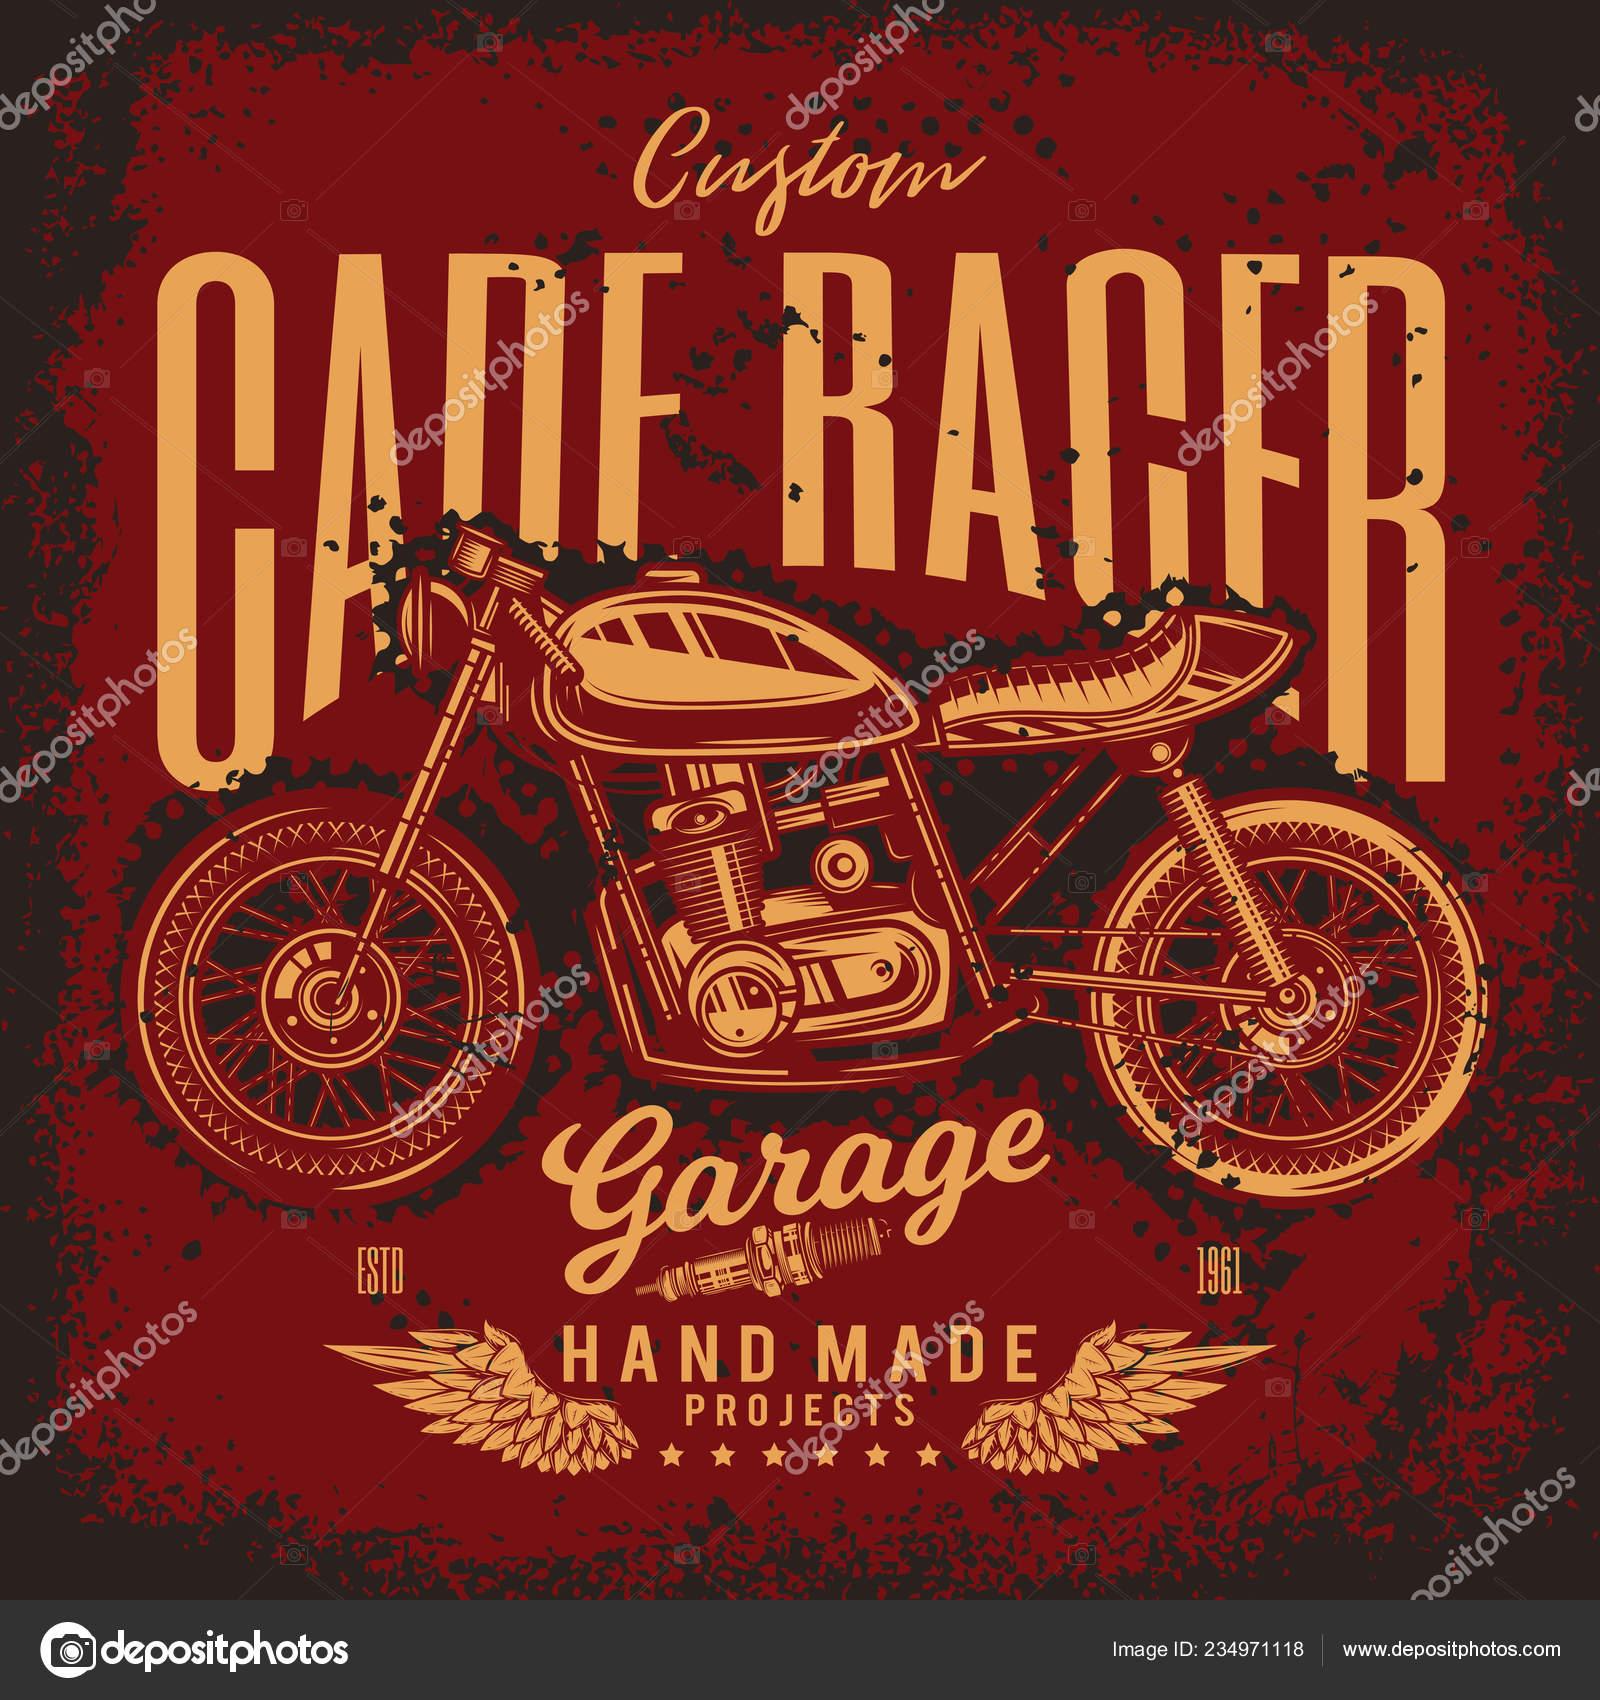 Vintage Cafe Racer Motorcycle Poster Vector Illustration Shirt Design Stock Vector C Rakhimovedgar 234971118